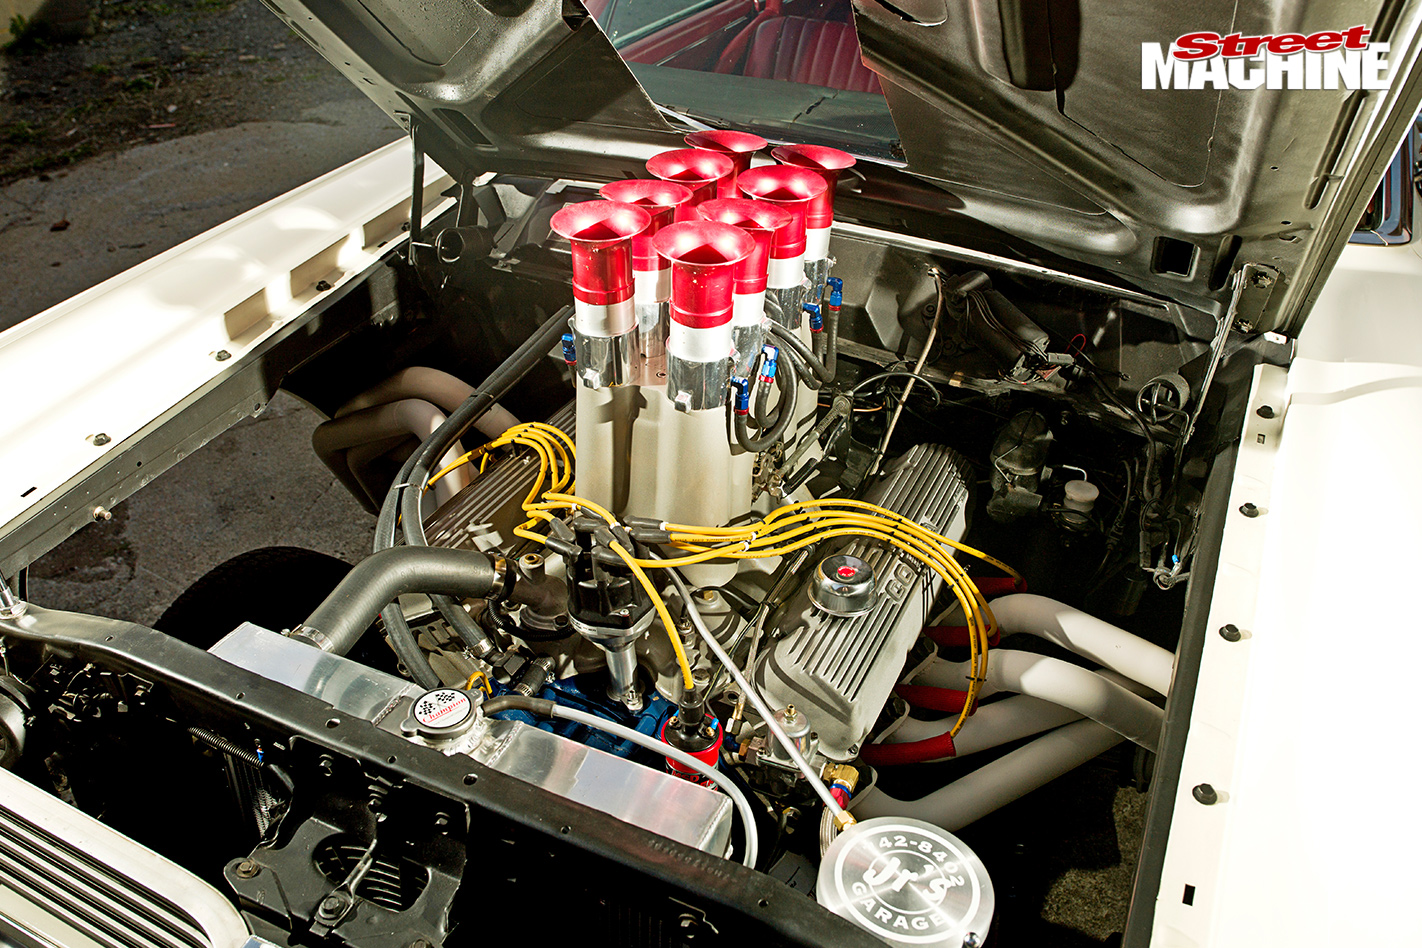 1967-MERCURY-COMET-GASSER-engine